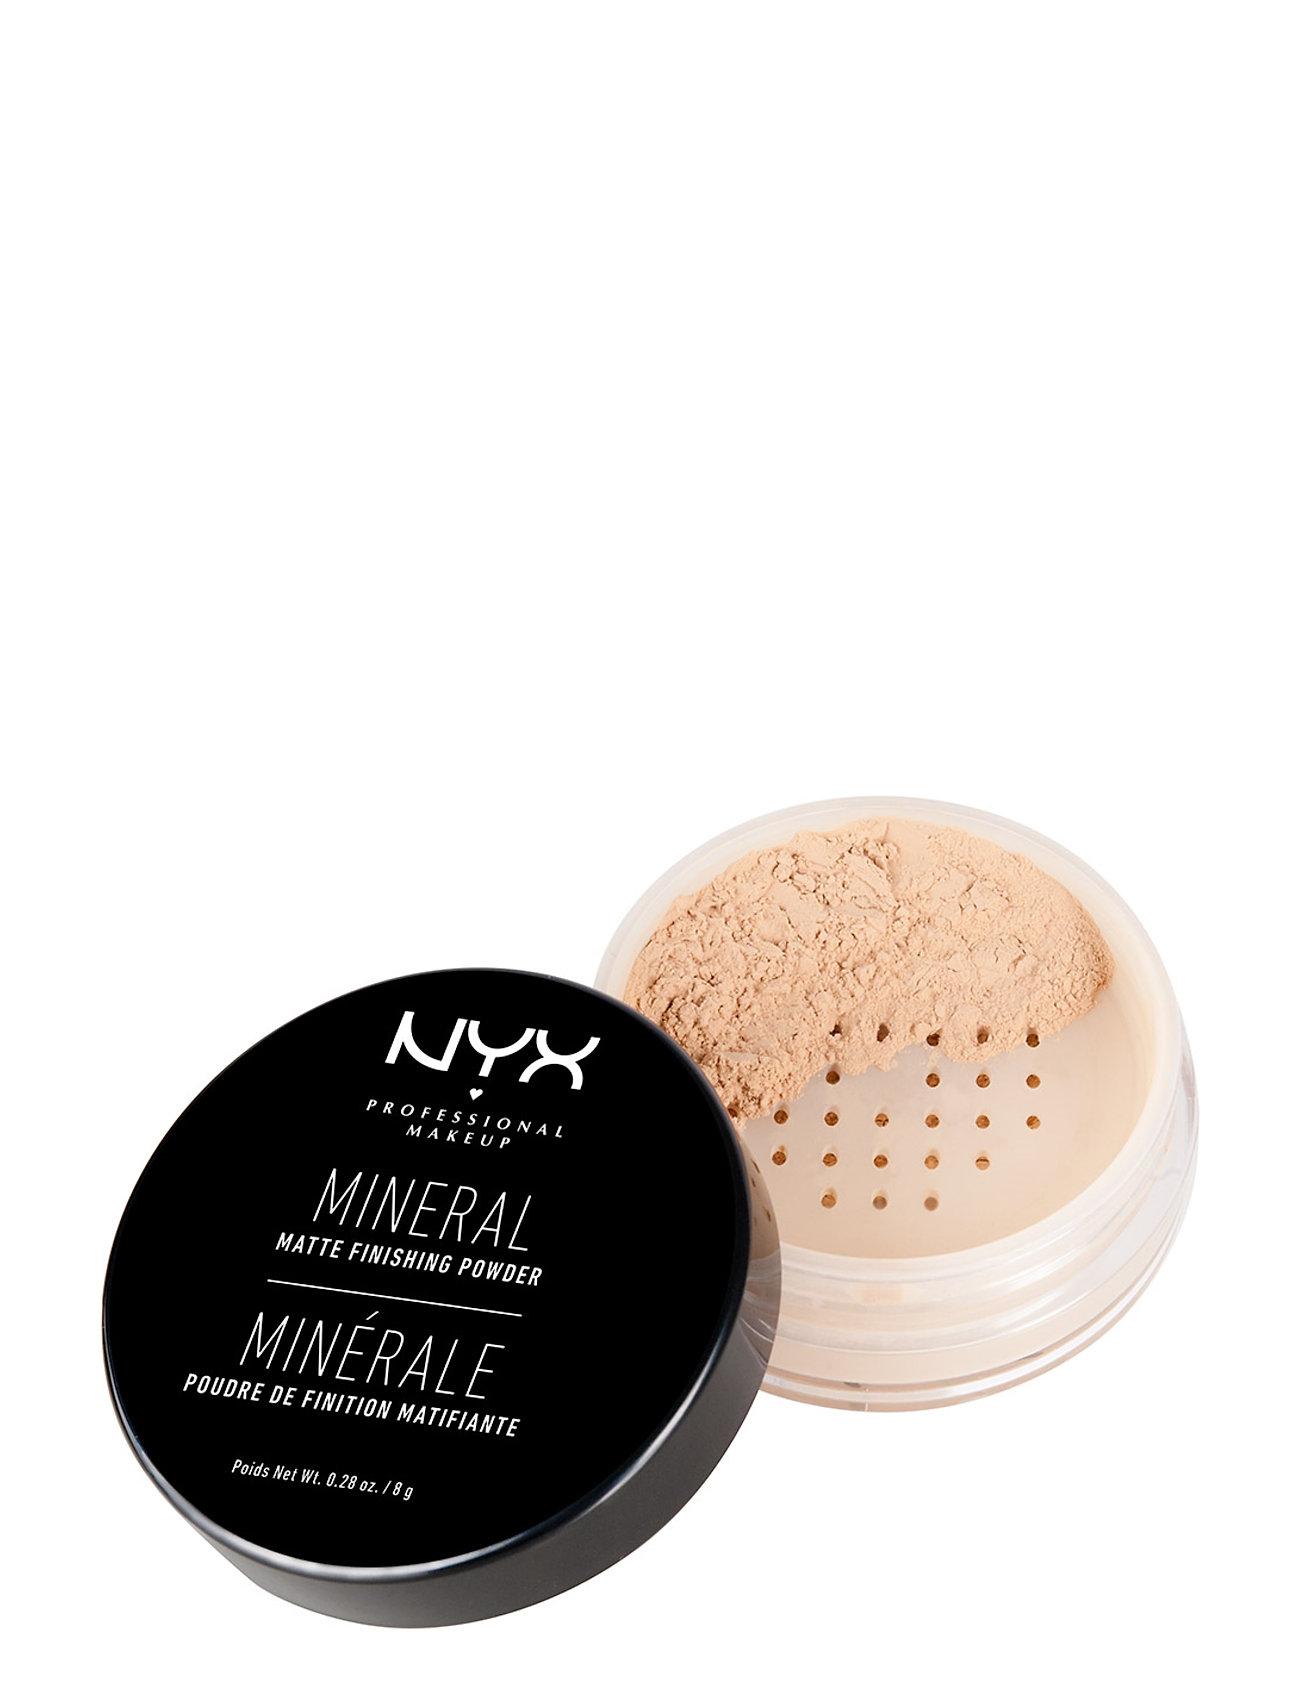 Image of Mineral Finishing Powder Pudder Makeup NYX PROFESSIONAL MAKEUP (3379134757)